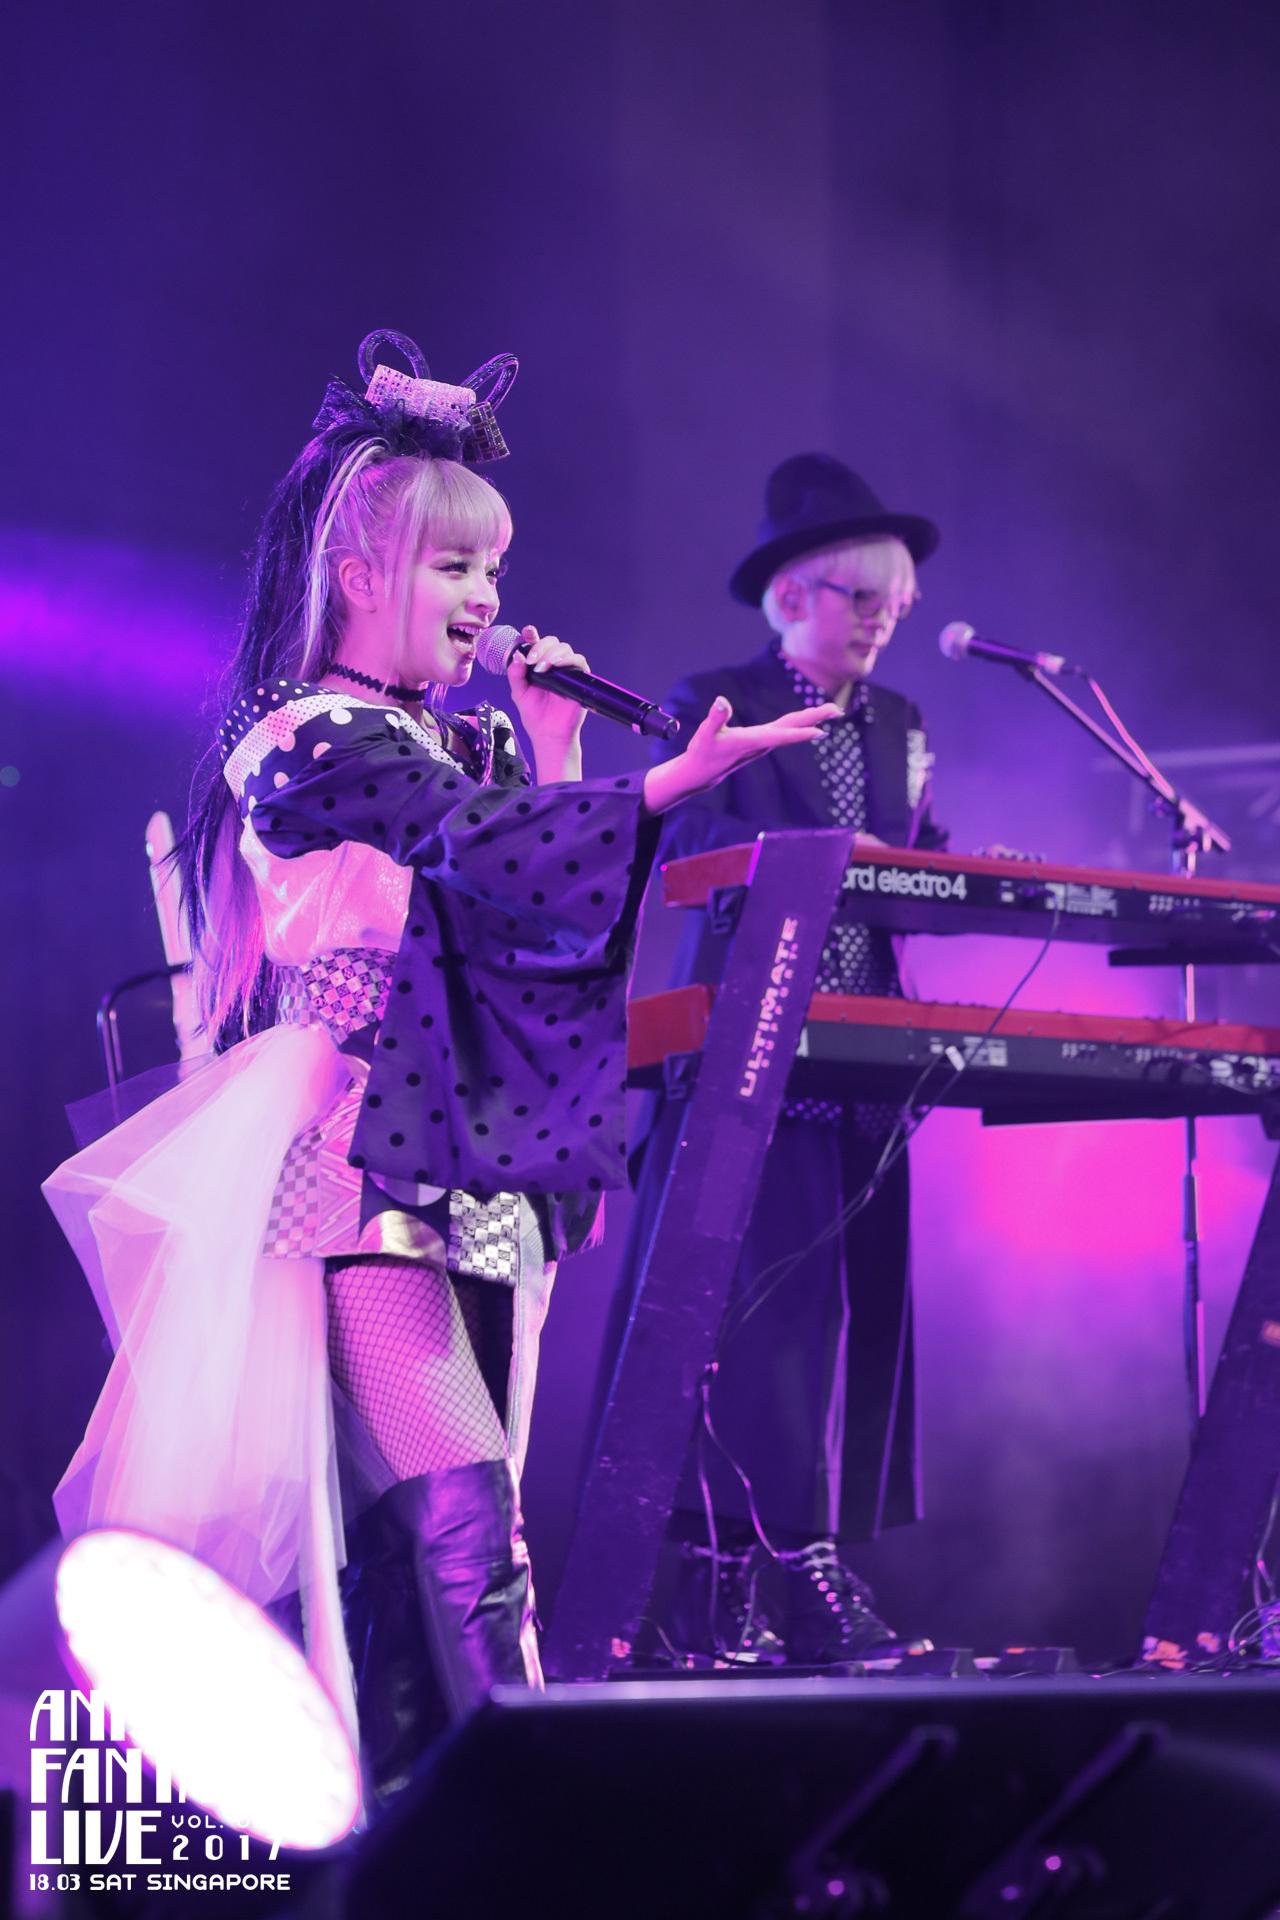 garnidelia anisong fantasy live 2017 singapore